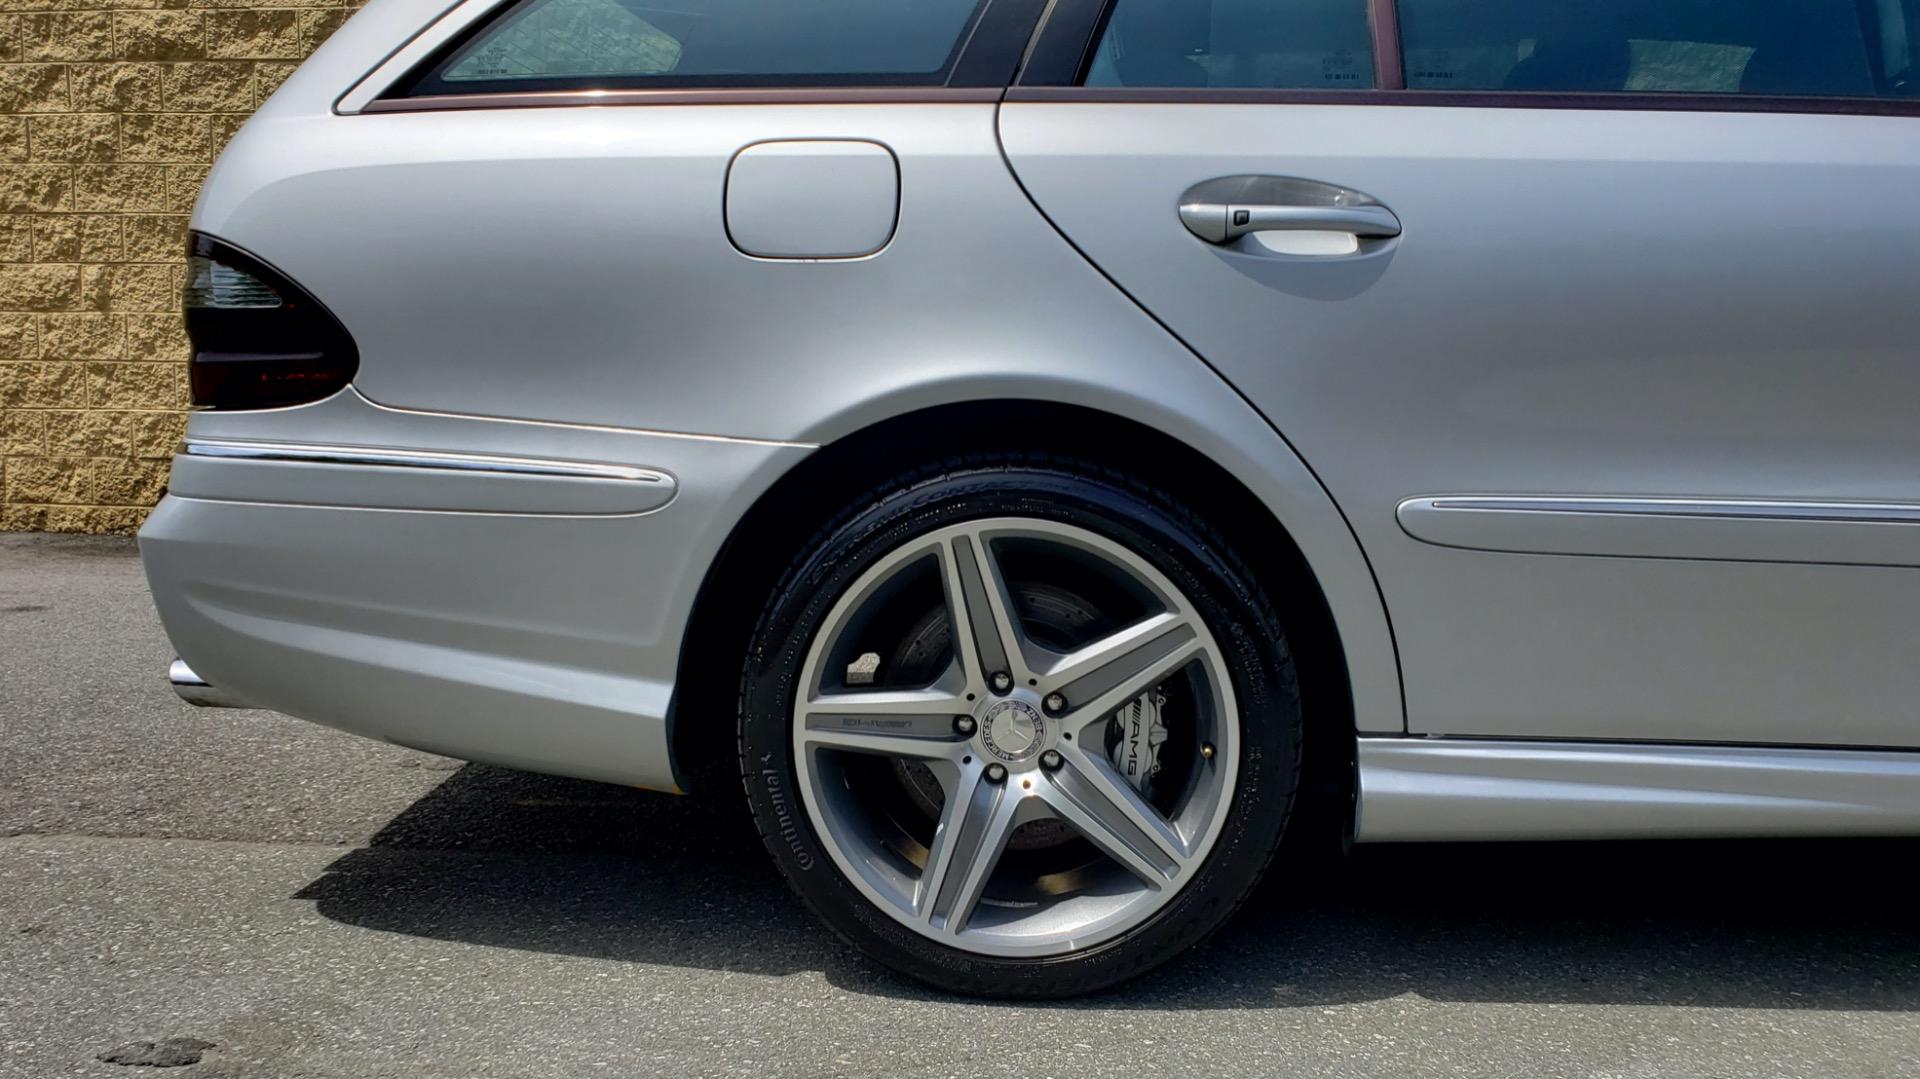 Used 2007 Mercedes-Benz E-Class E63 AMG WAGON / NAV / SUNROOF / HARMAN/KARDON for sale $29,000 at Formula Imports in Charlotte NC 28227 84